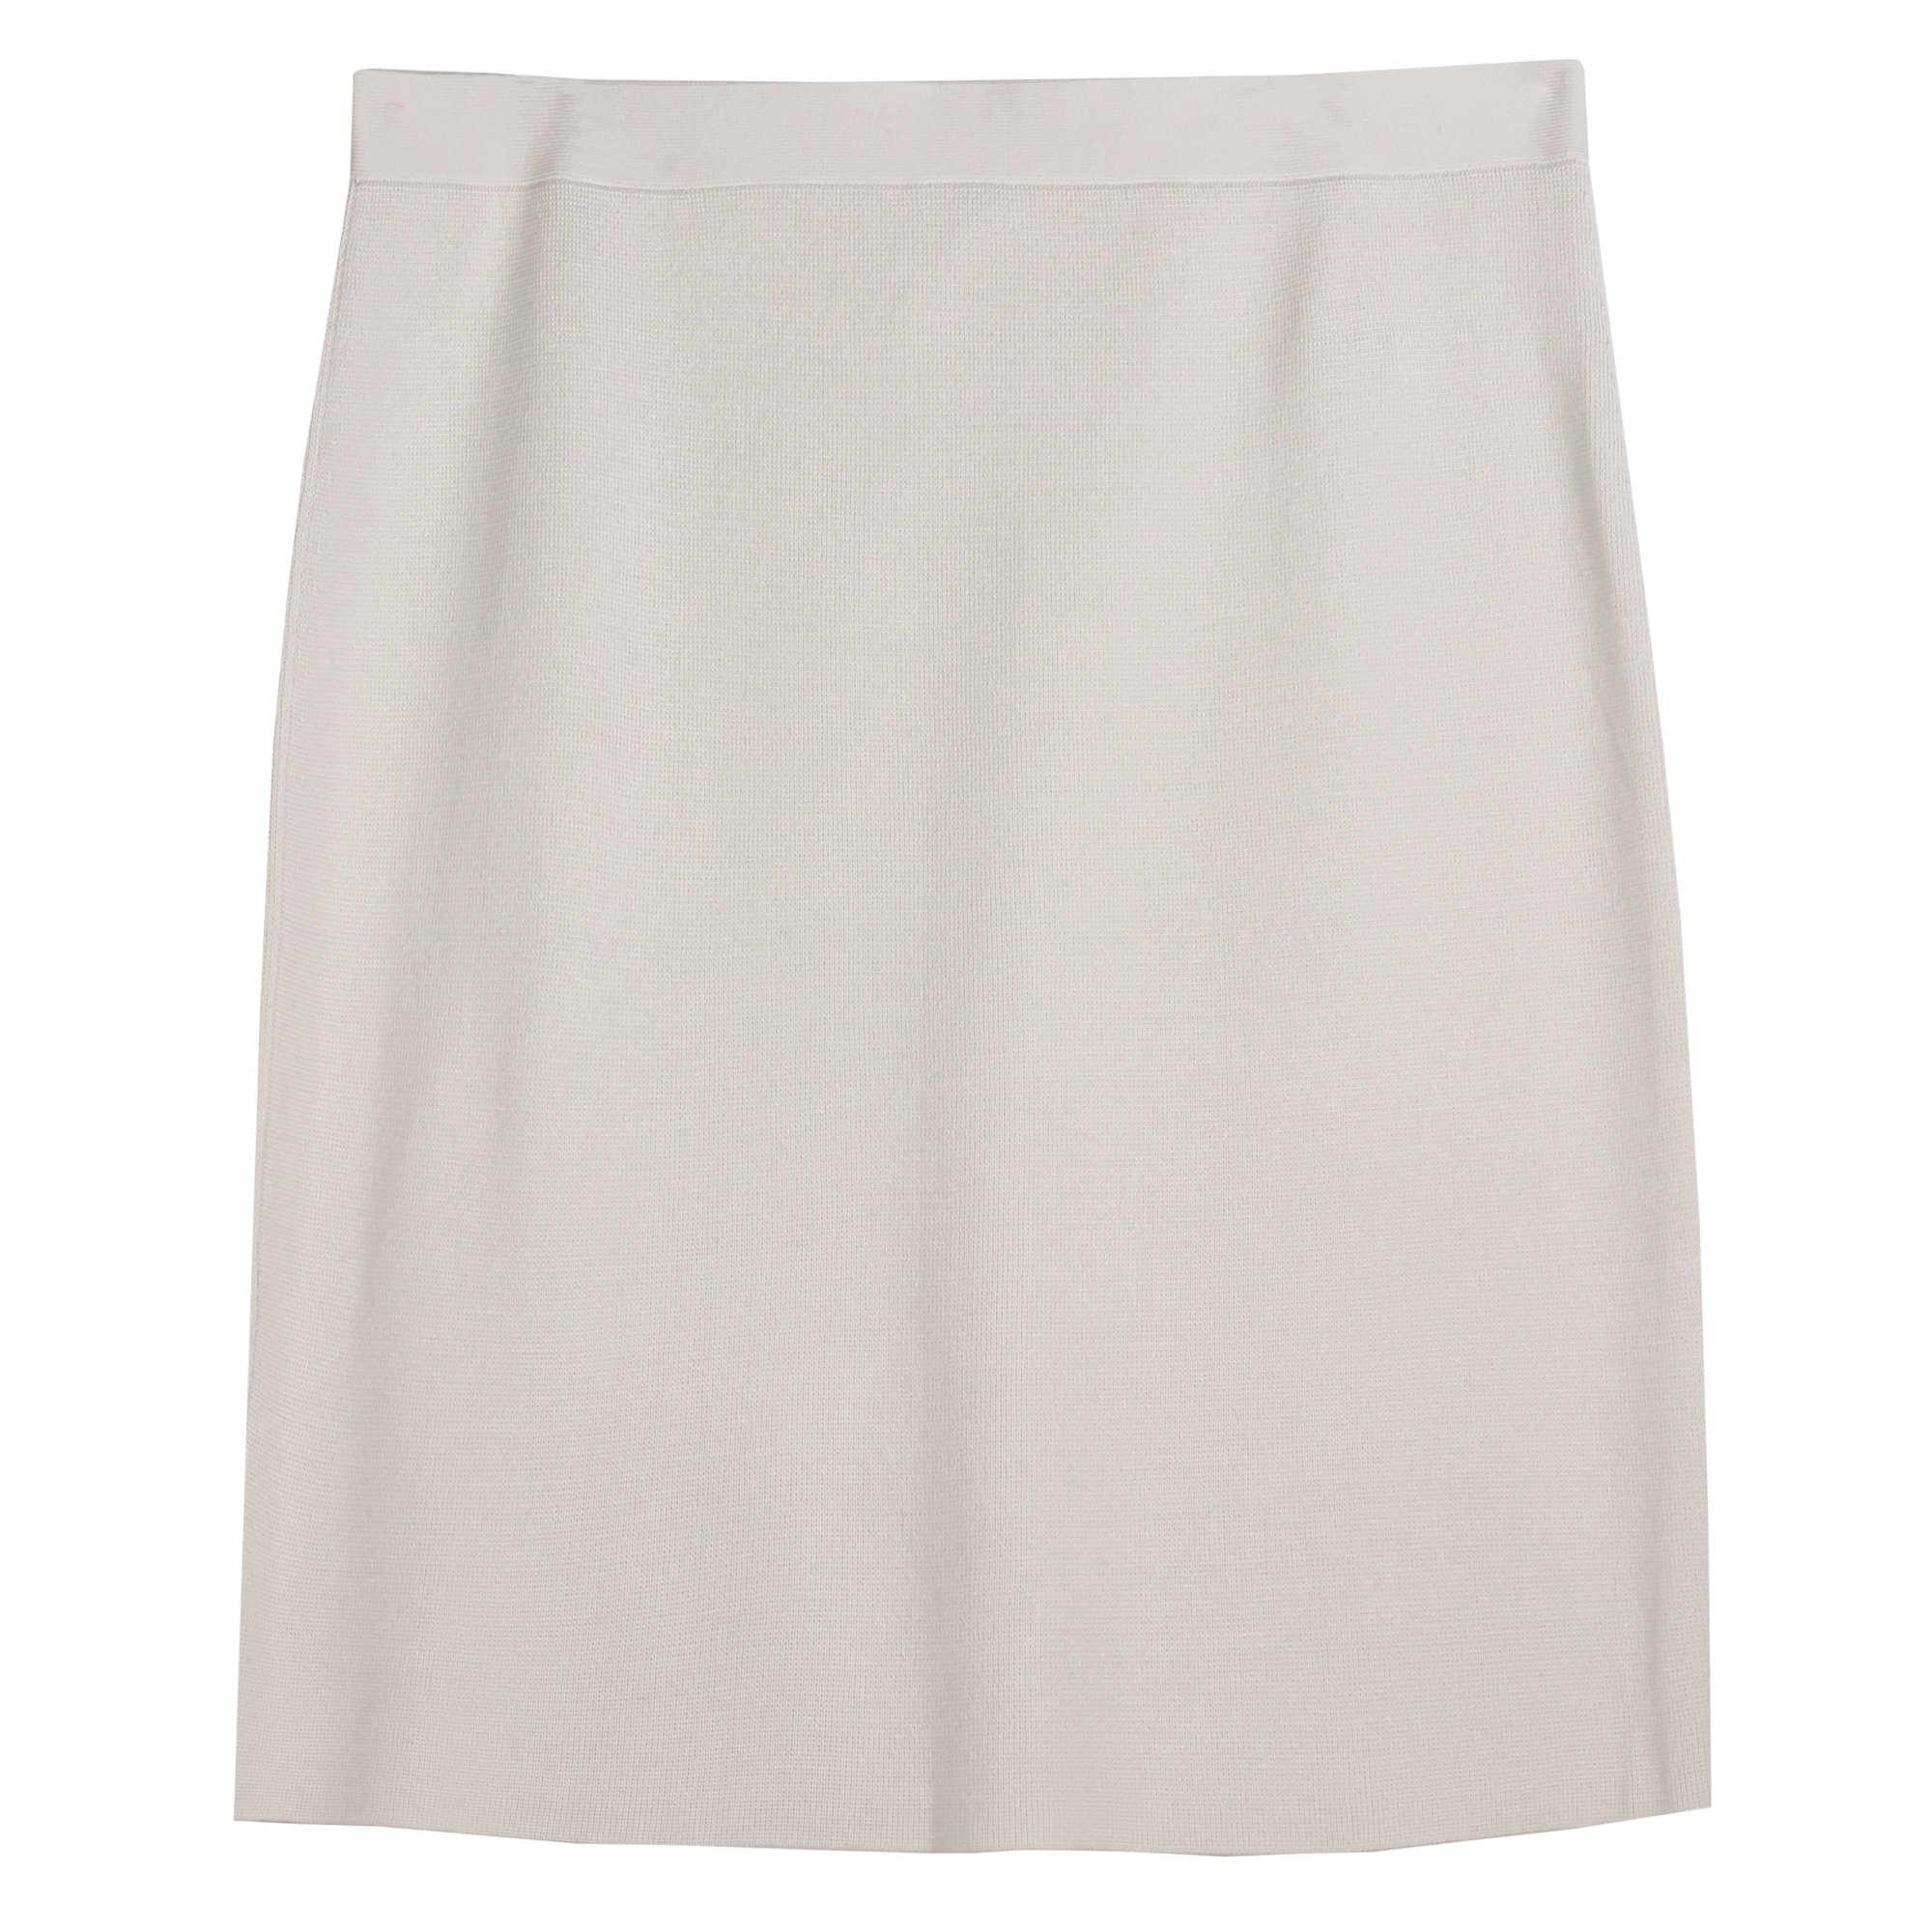 Silk Organic Cotton Interlock Skirt